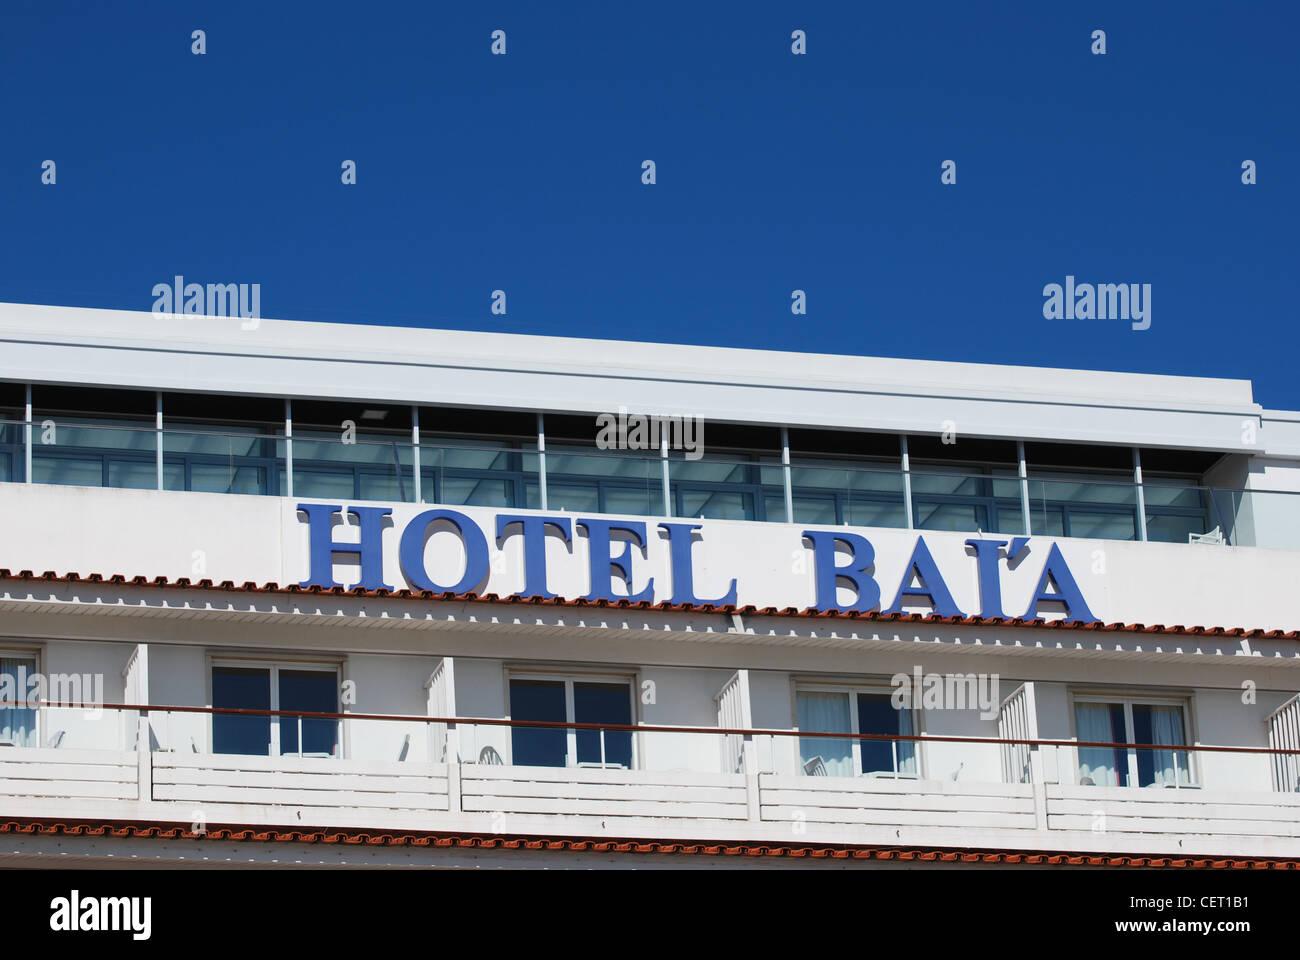 Hotel Baia Cascais : Hotel baia cascais stockfotos & hotel baia cascais bilder alamy